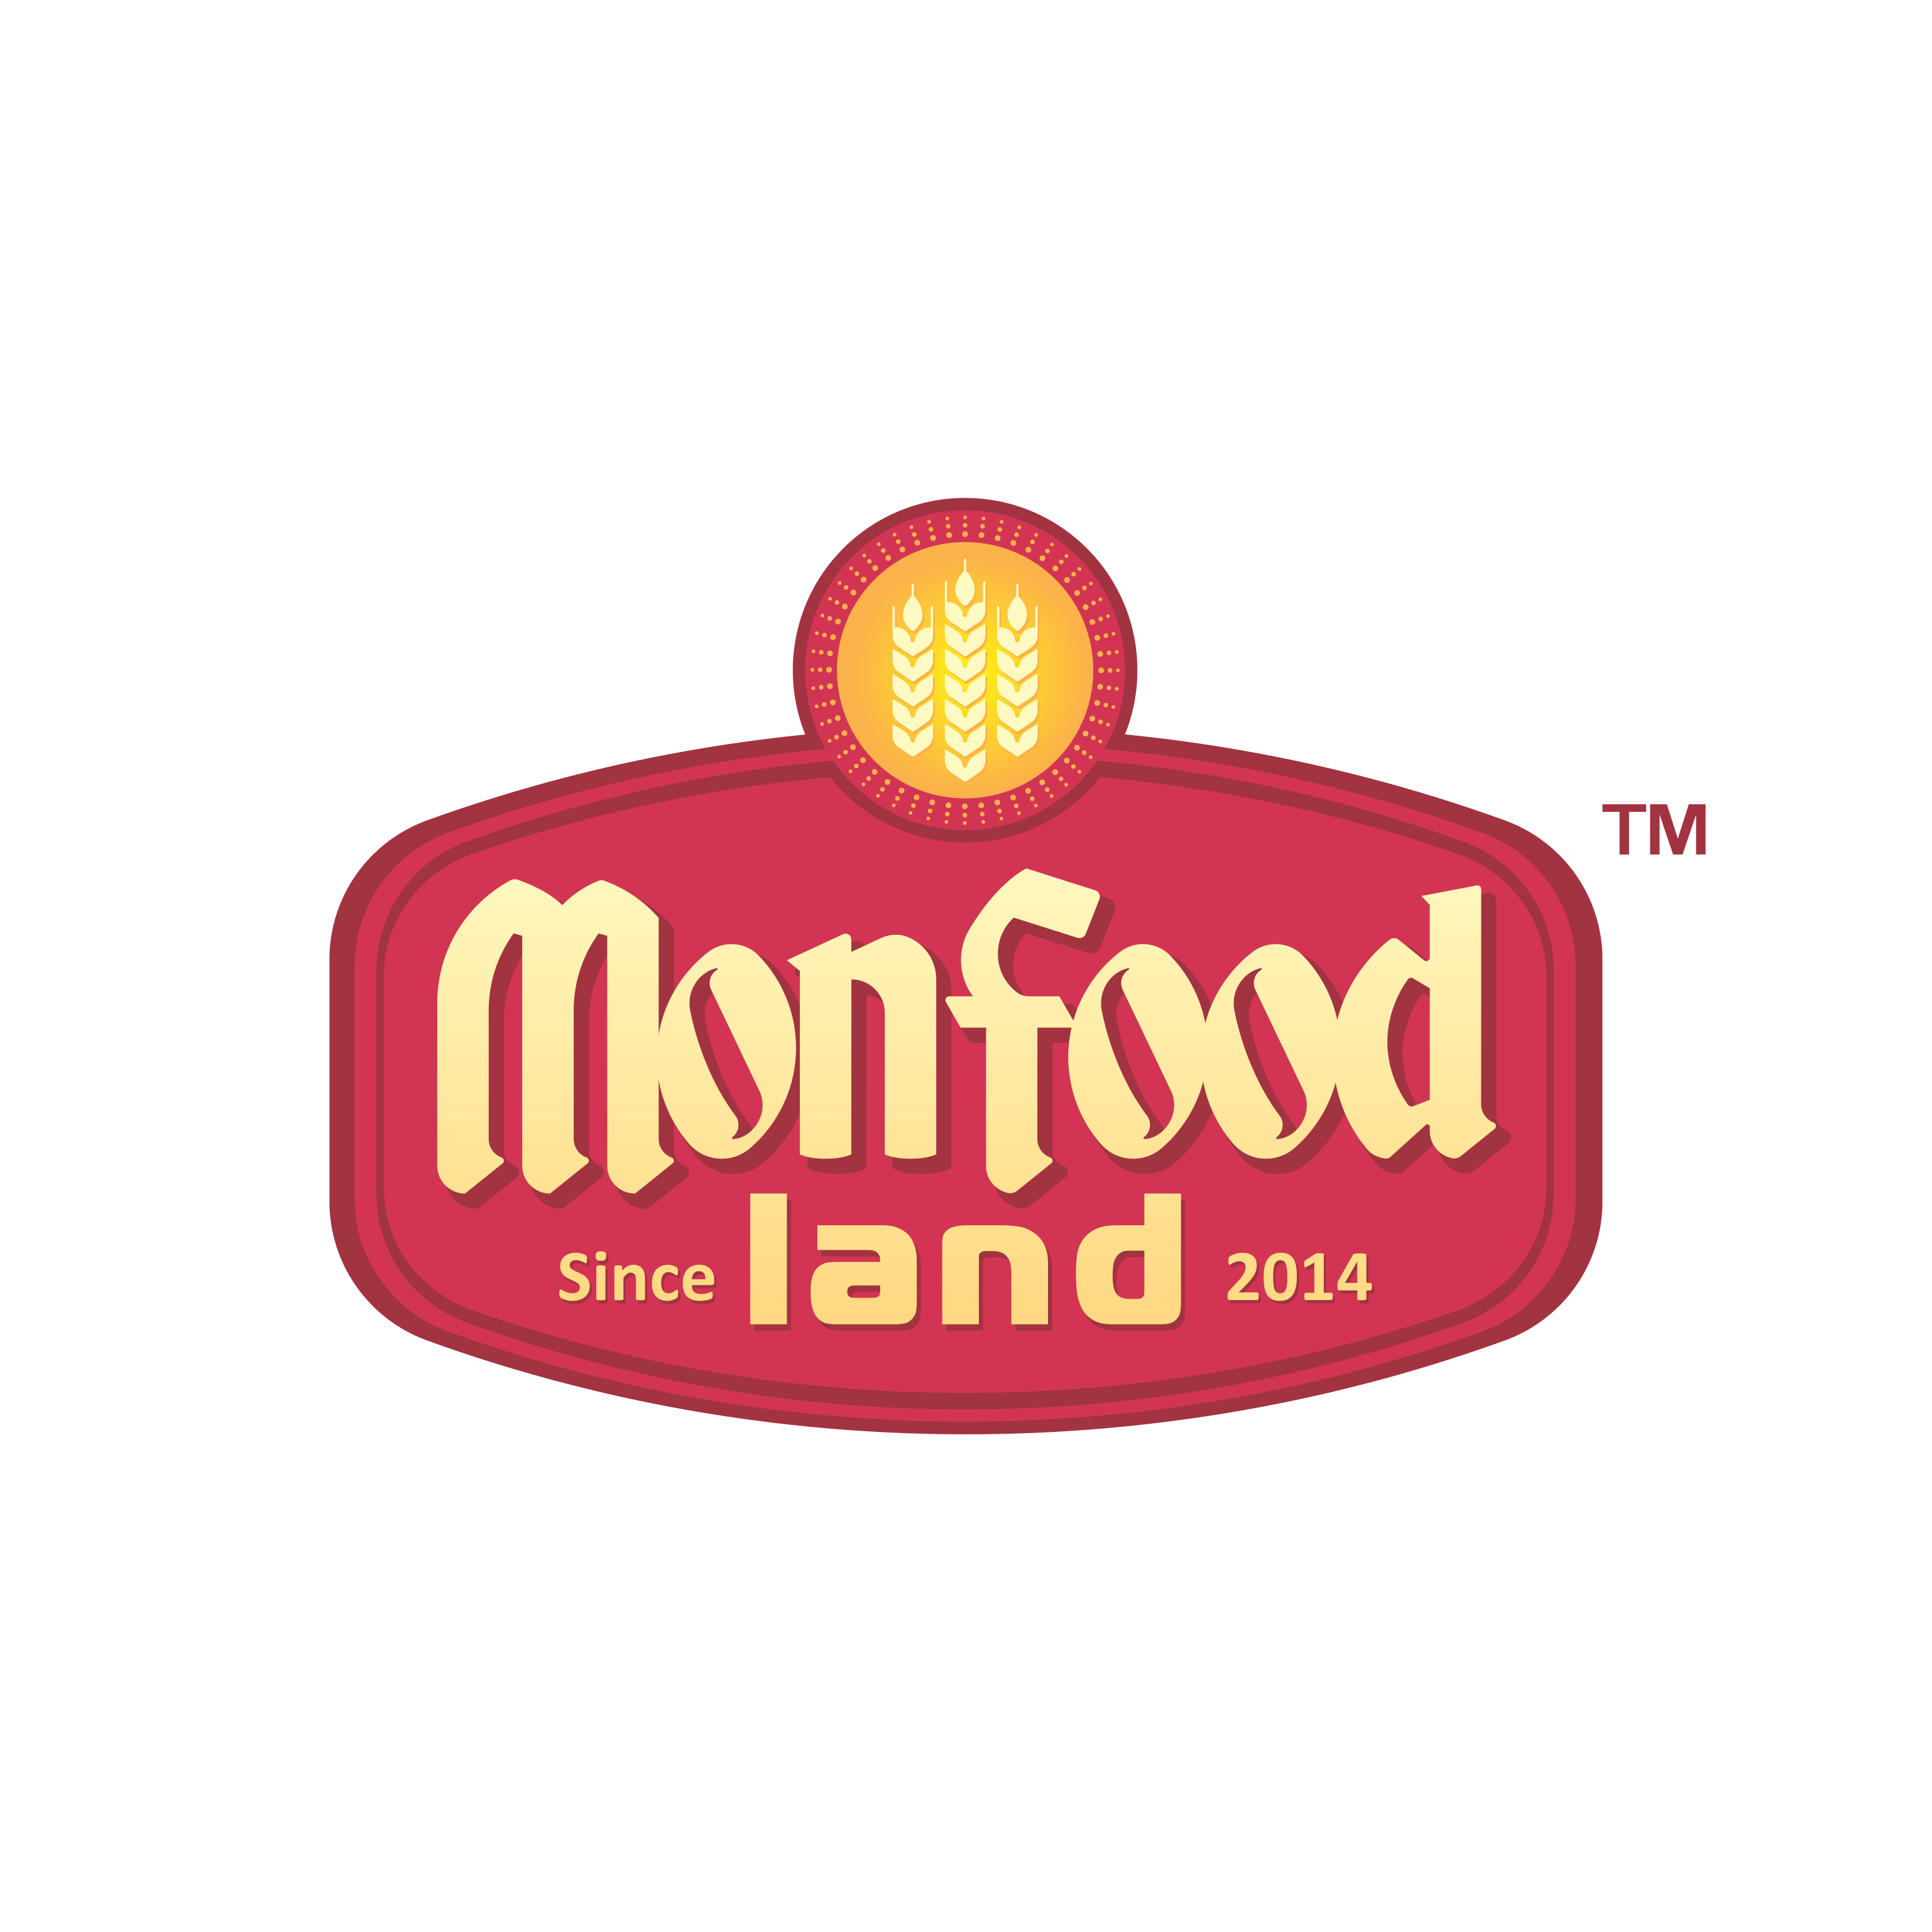 Monfoodland